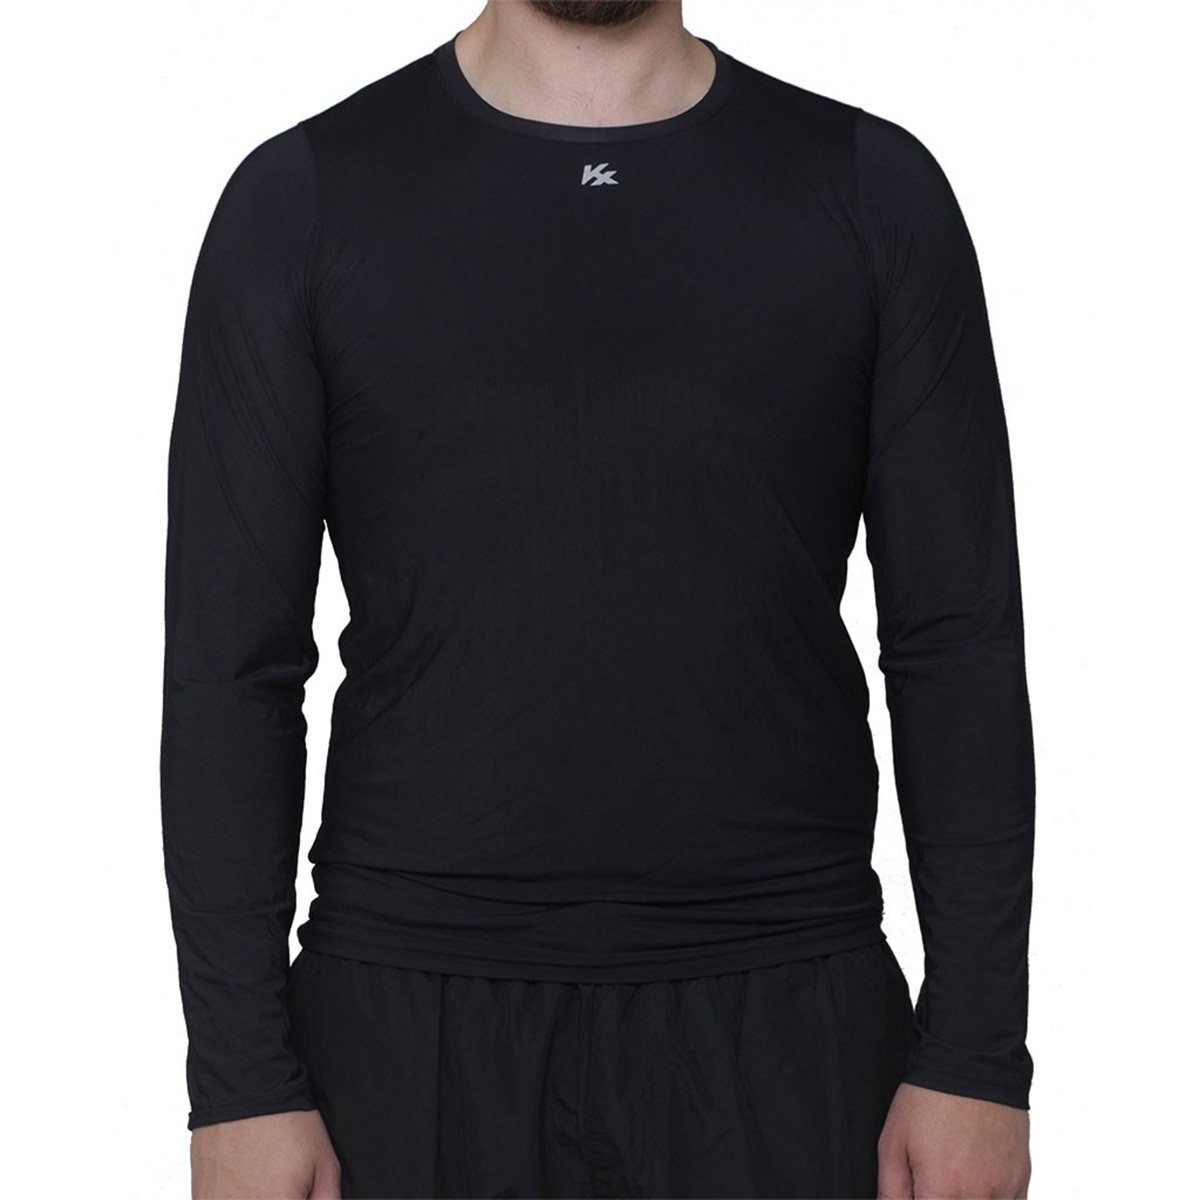 camisa termica kanxa alta compressao masculina 6400.006 - m. Carregando  zoom. efbd0c6357cdc